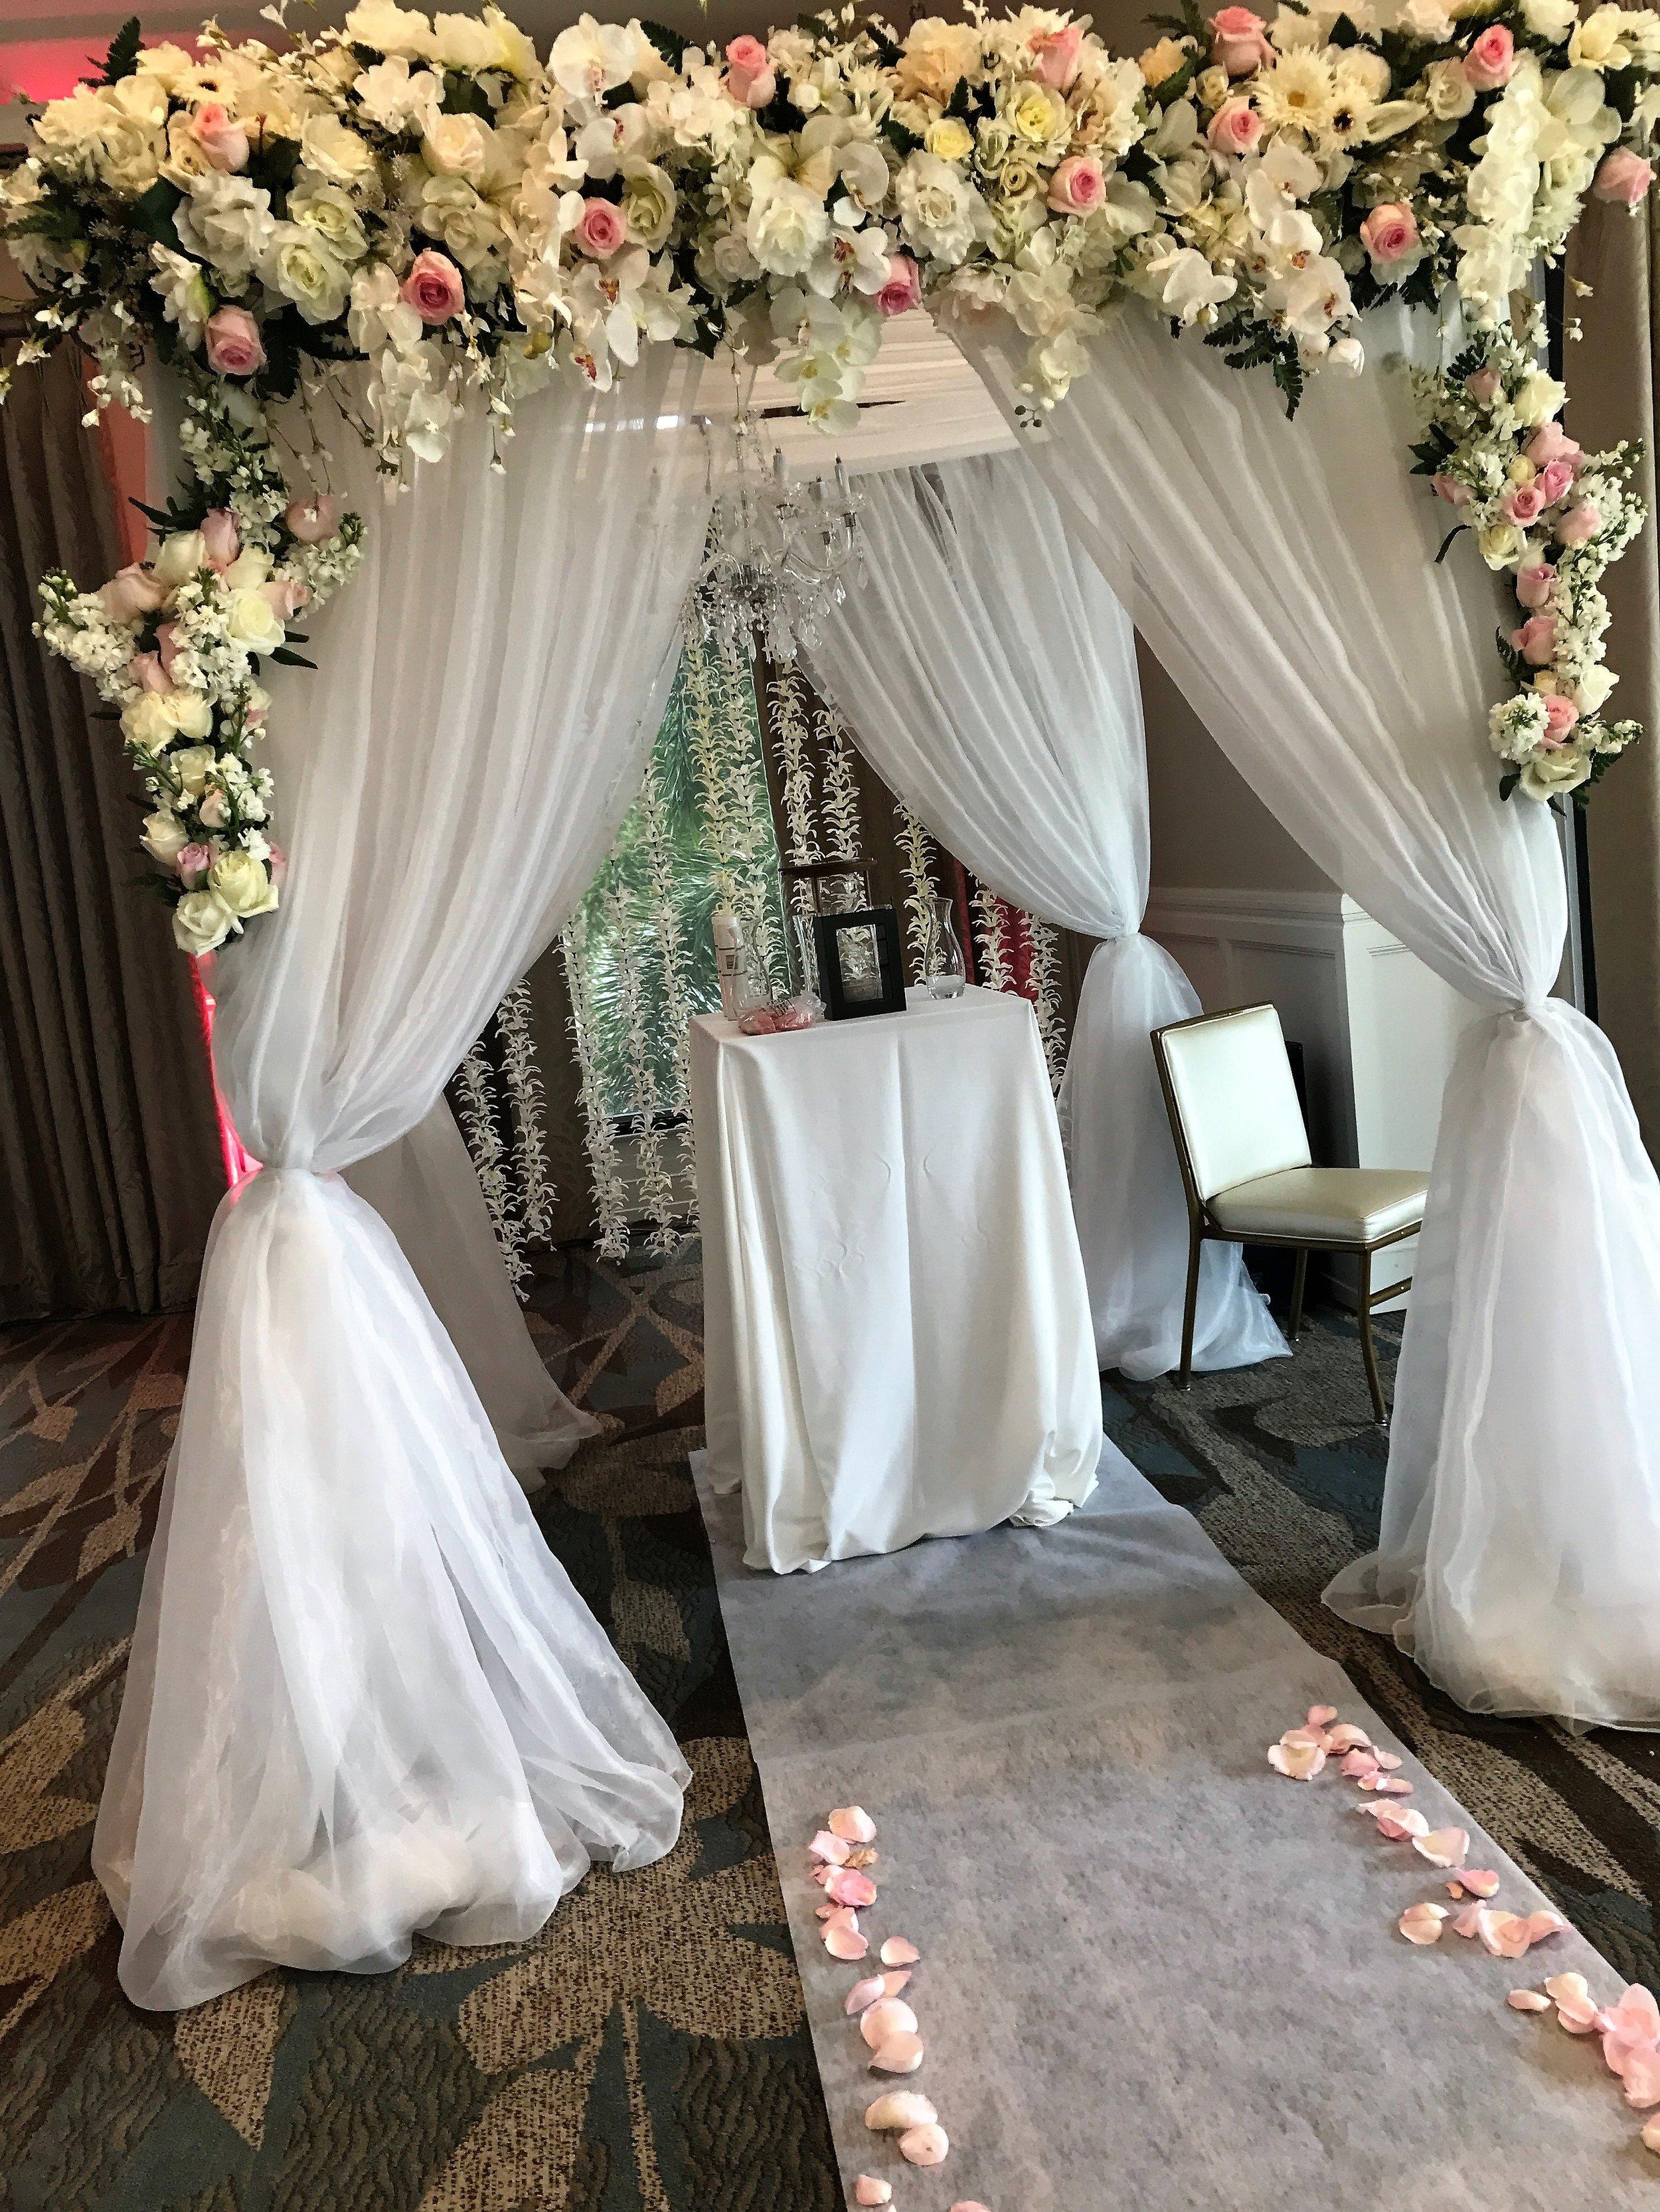 Palm beach county florist wedding arch design